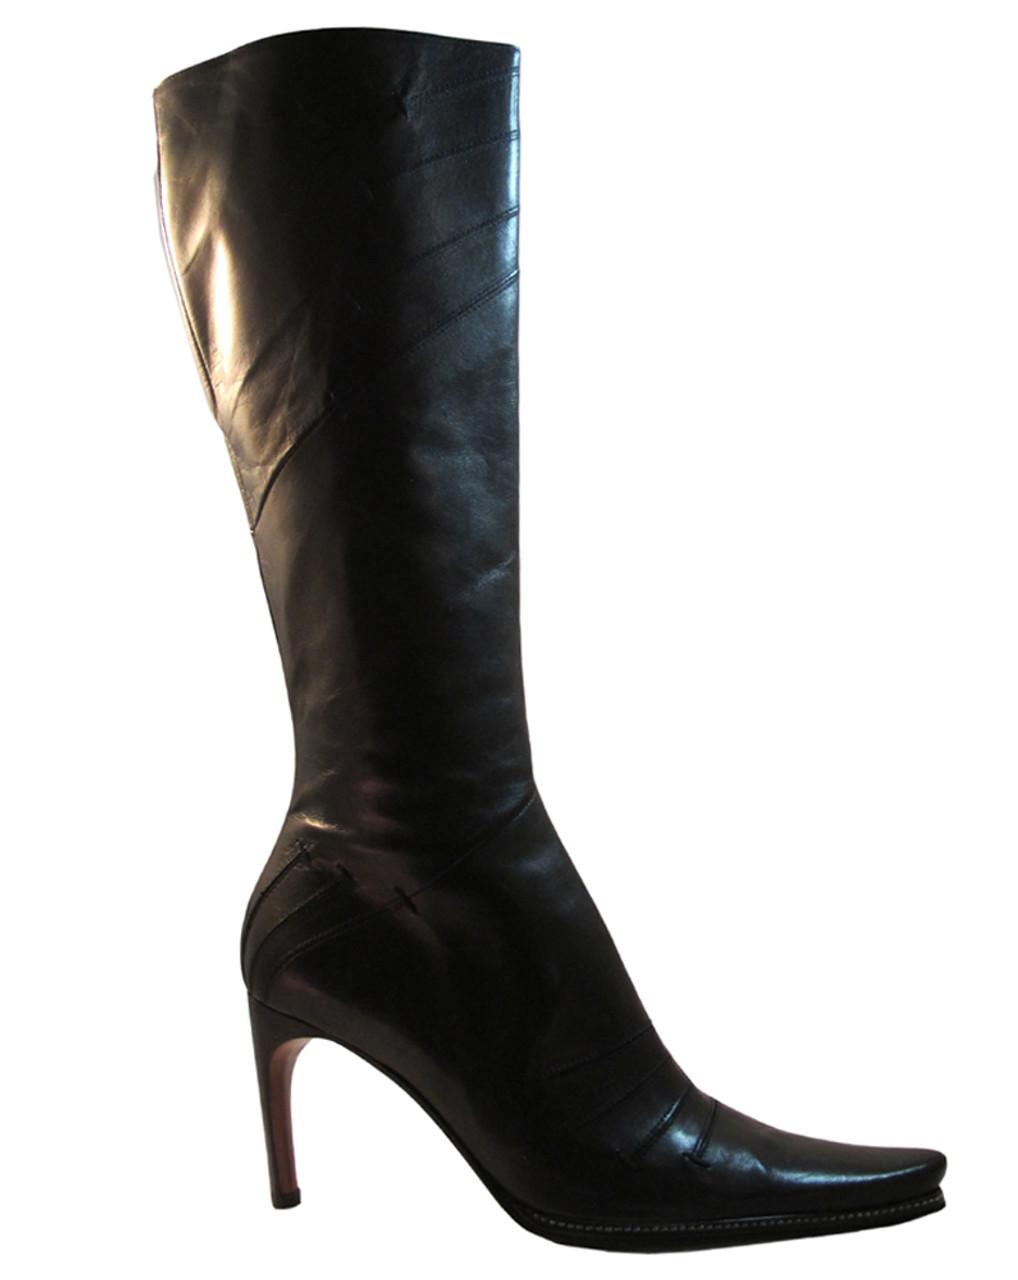 Aketohn 8520 Women's Dressy Italian